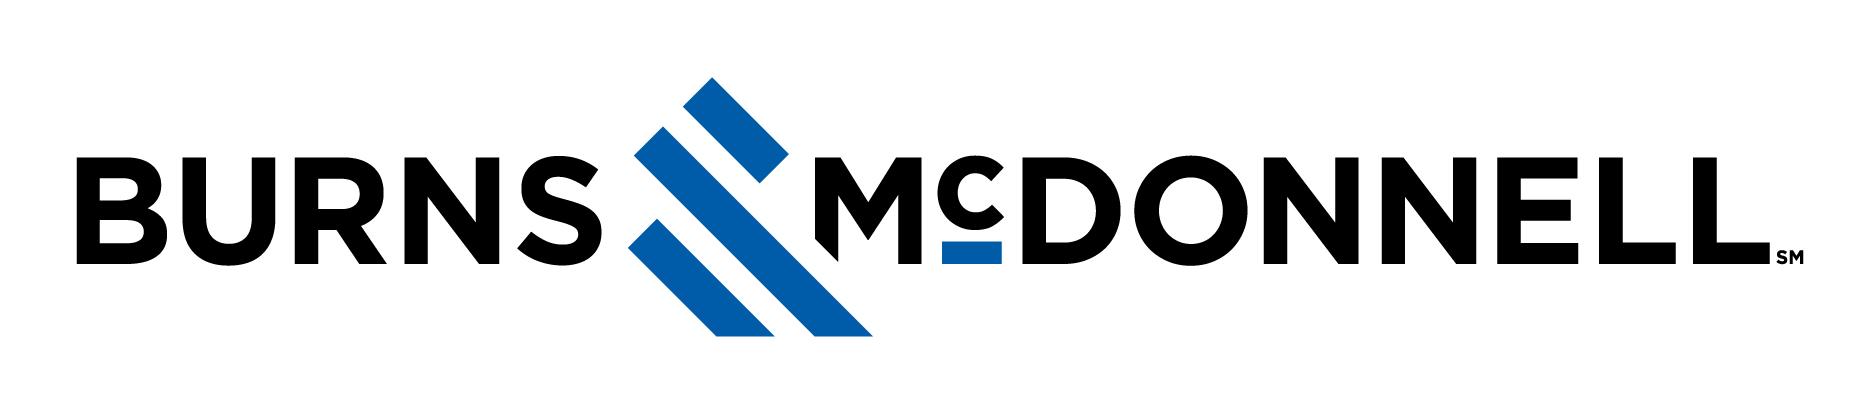 Burns & McDonnell Logo (Horizontal).jpg